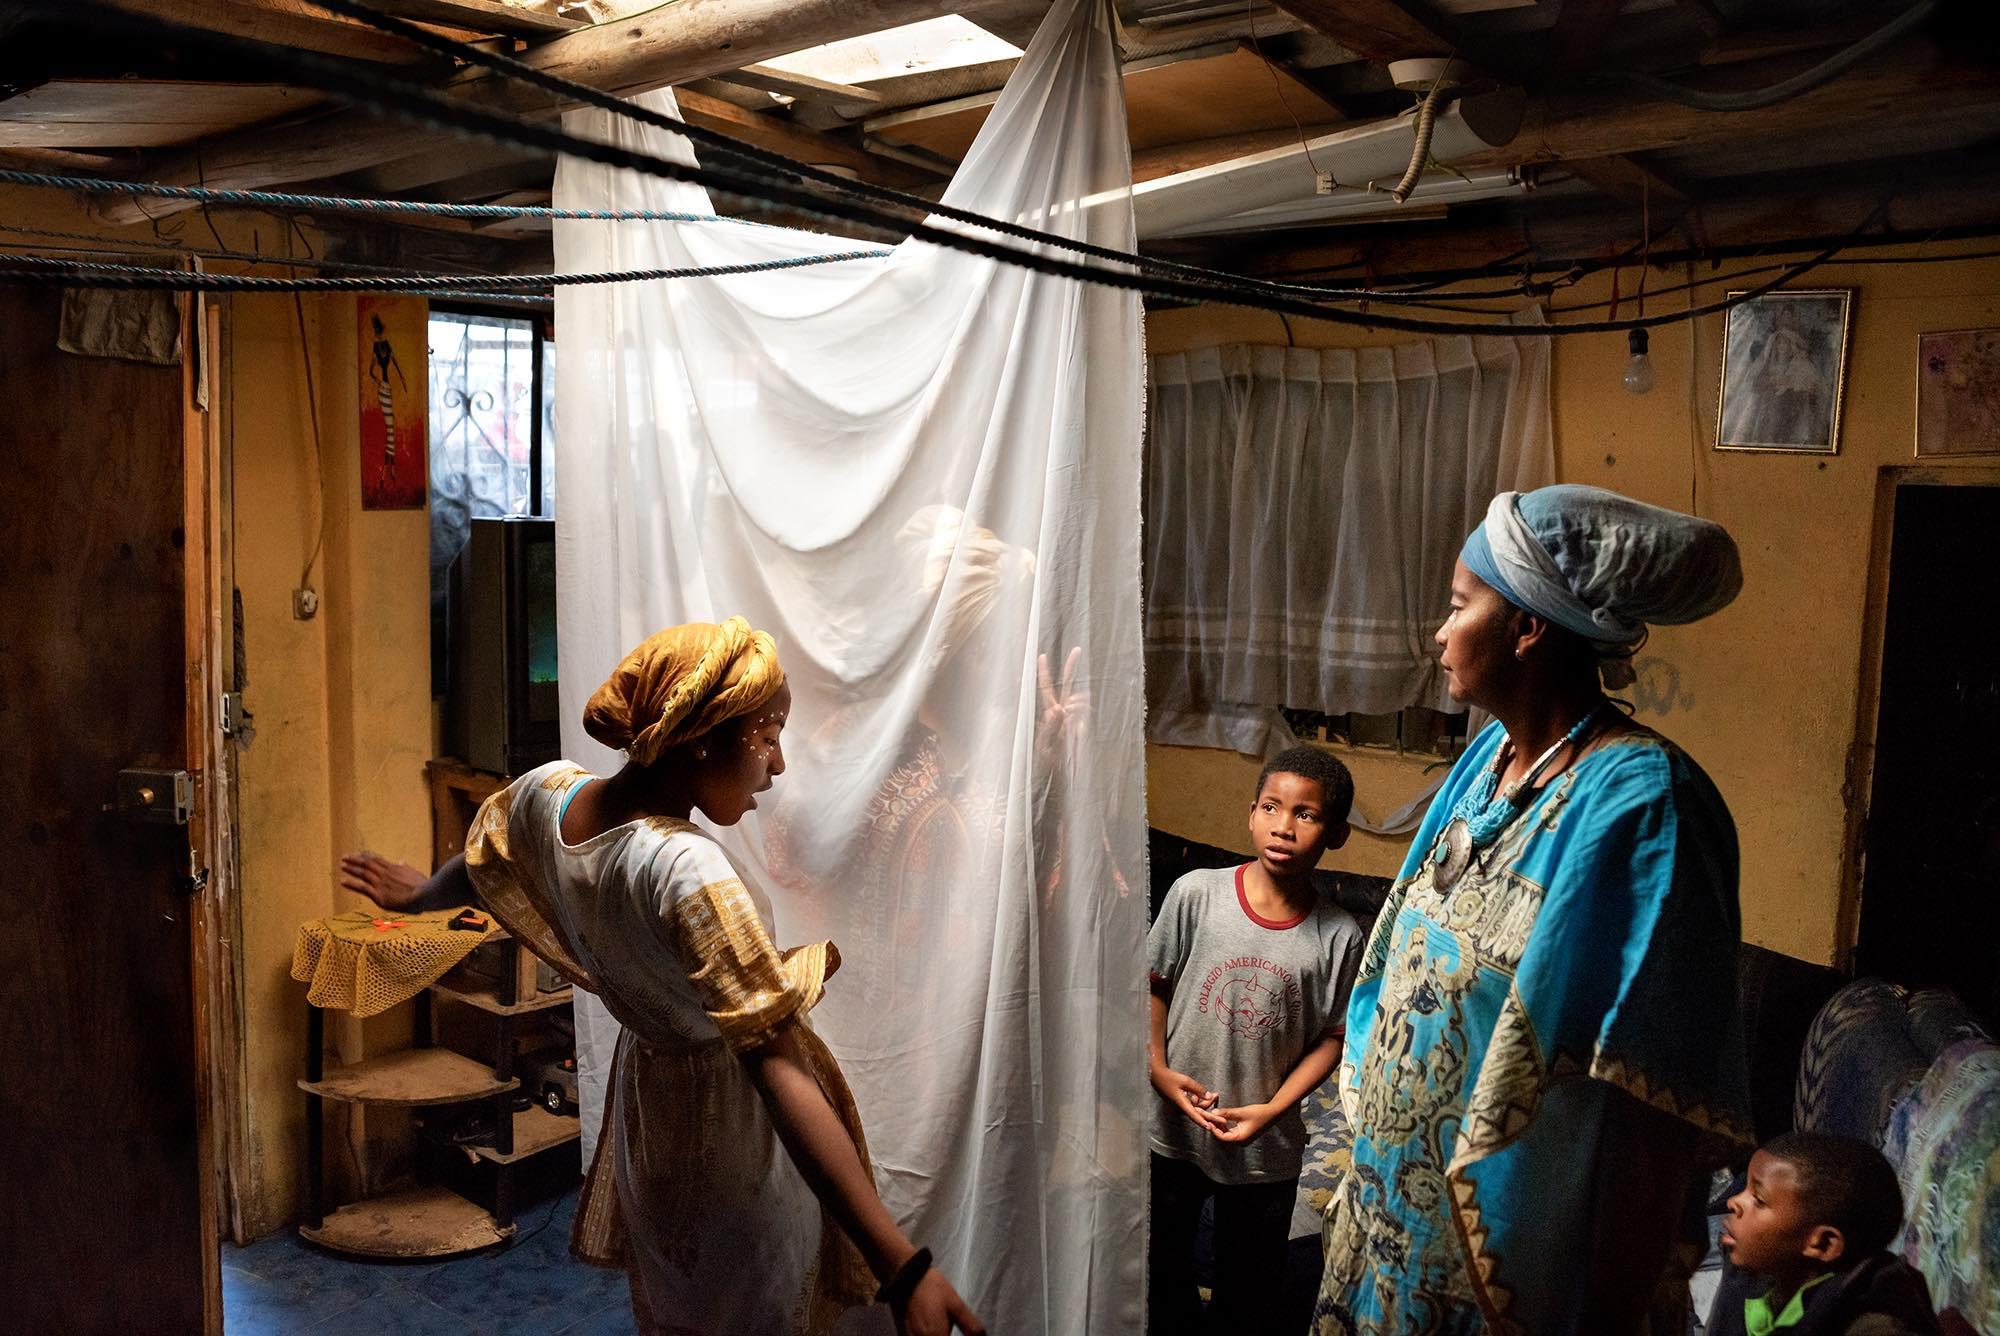 Spirituality and storytelling in Afro-Ecuadorian communities